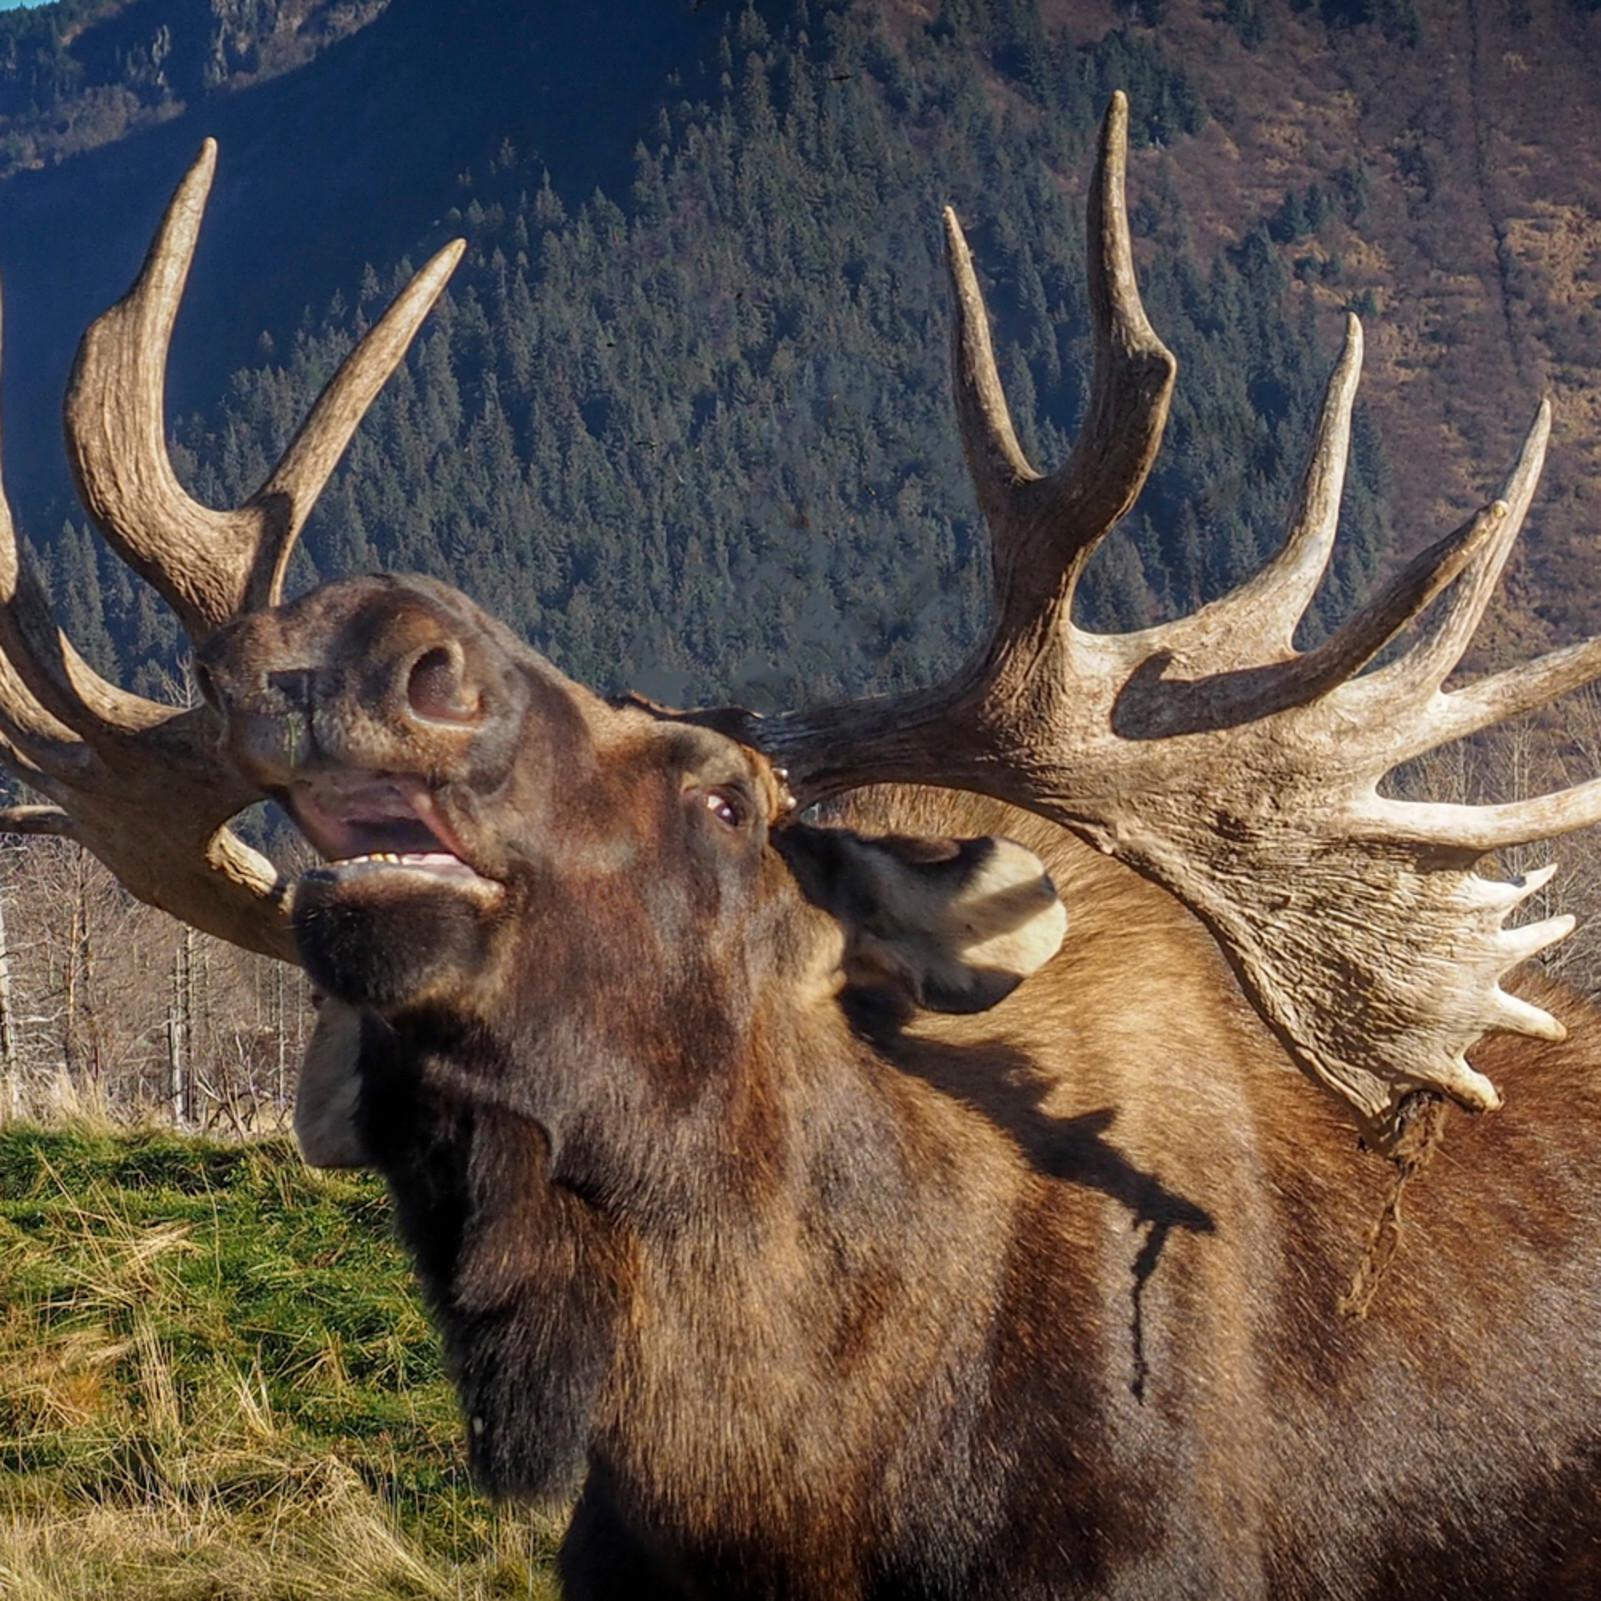 Alaskan bull moose finalsignature dnpuzp